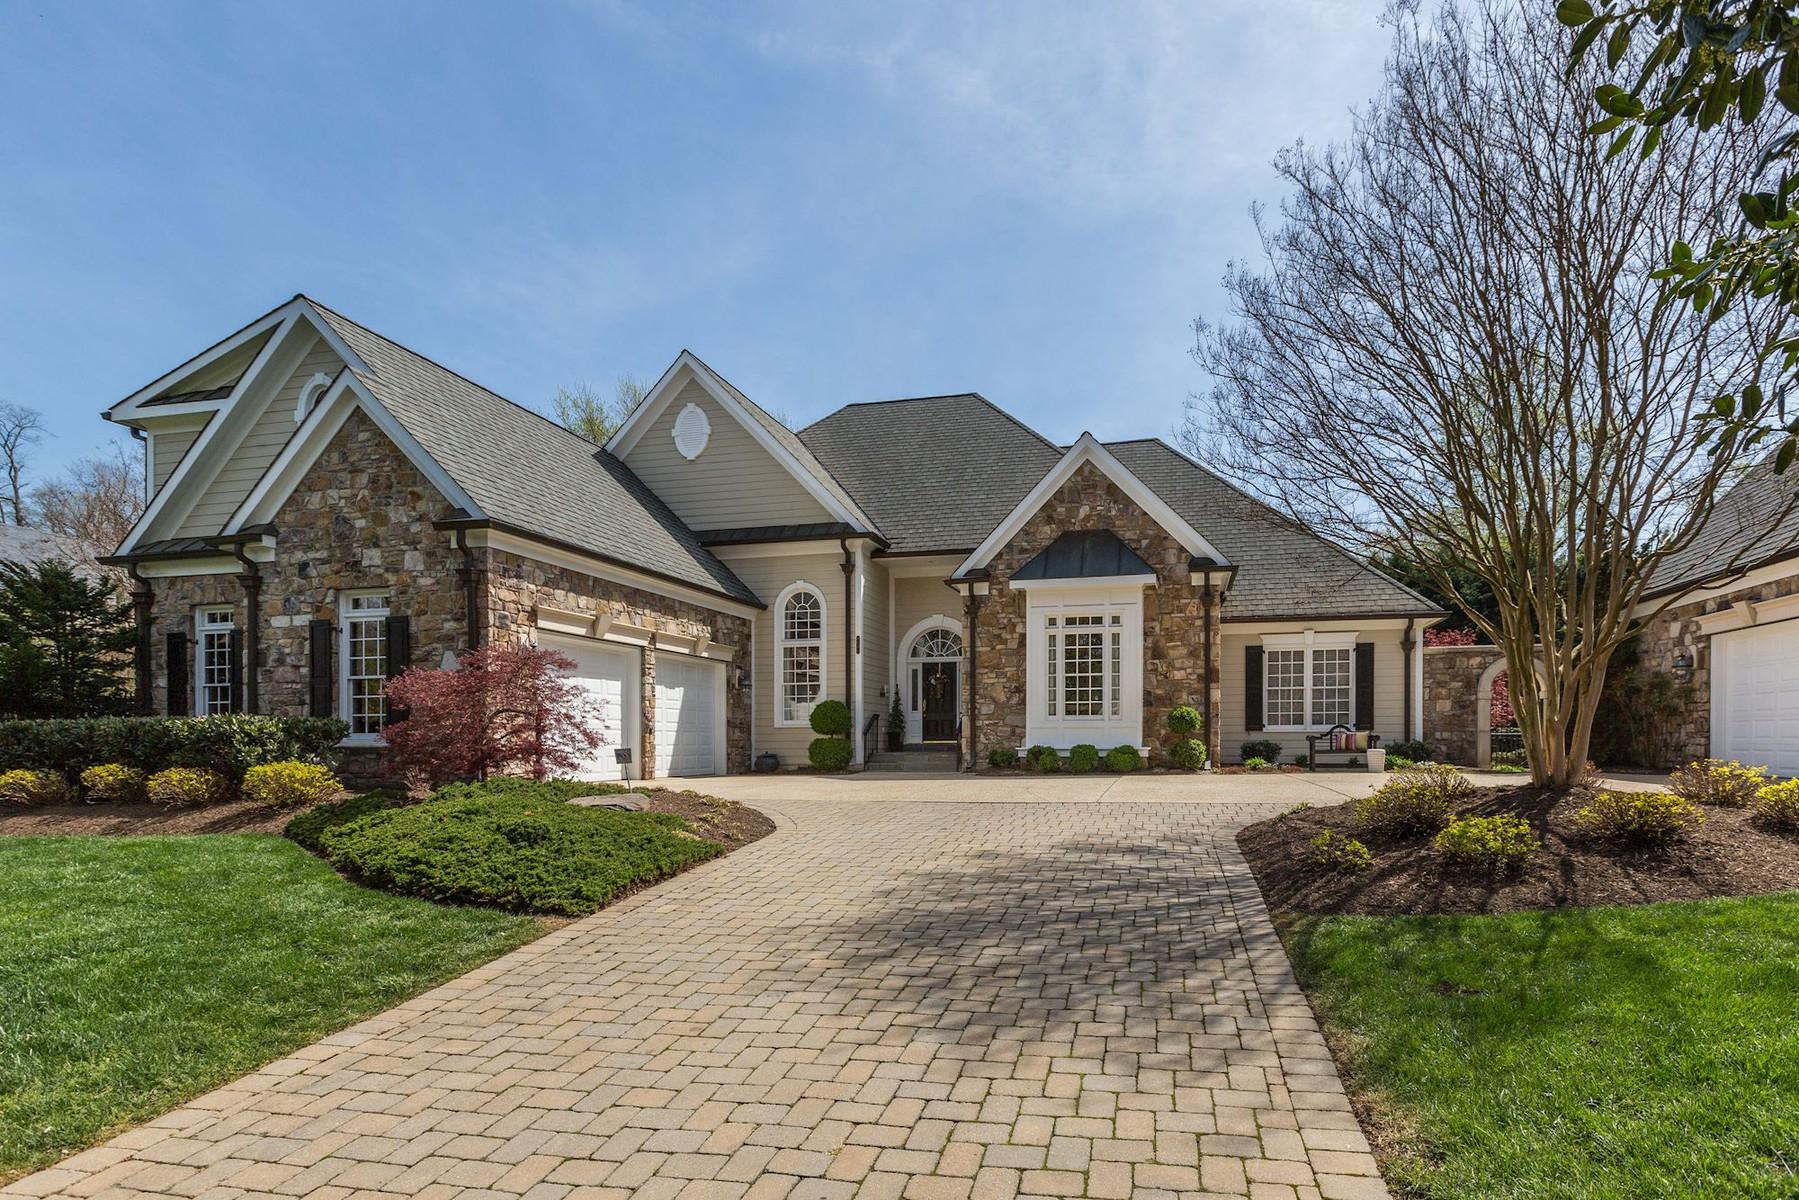 Single Family Home for Sale at 6601 Malta Lane, Mclean 6601 Malta Ln McLean, Virginia, 22101 United States